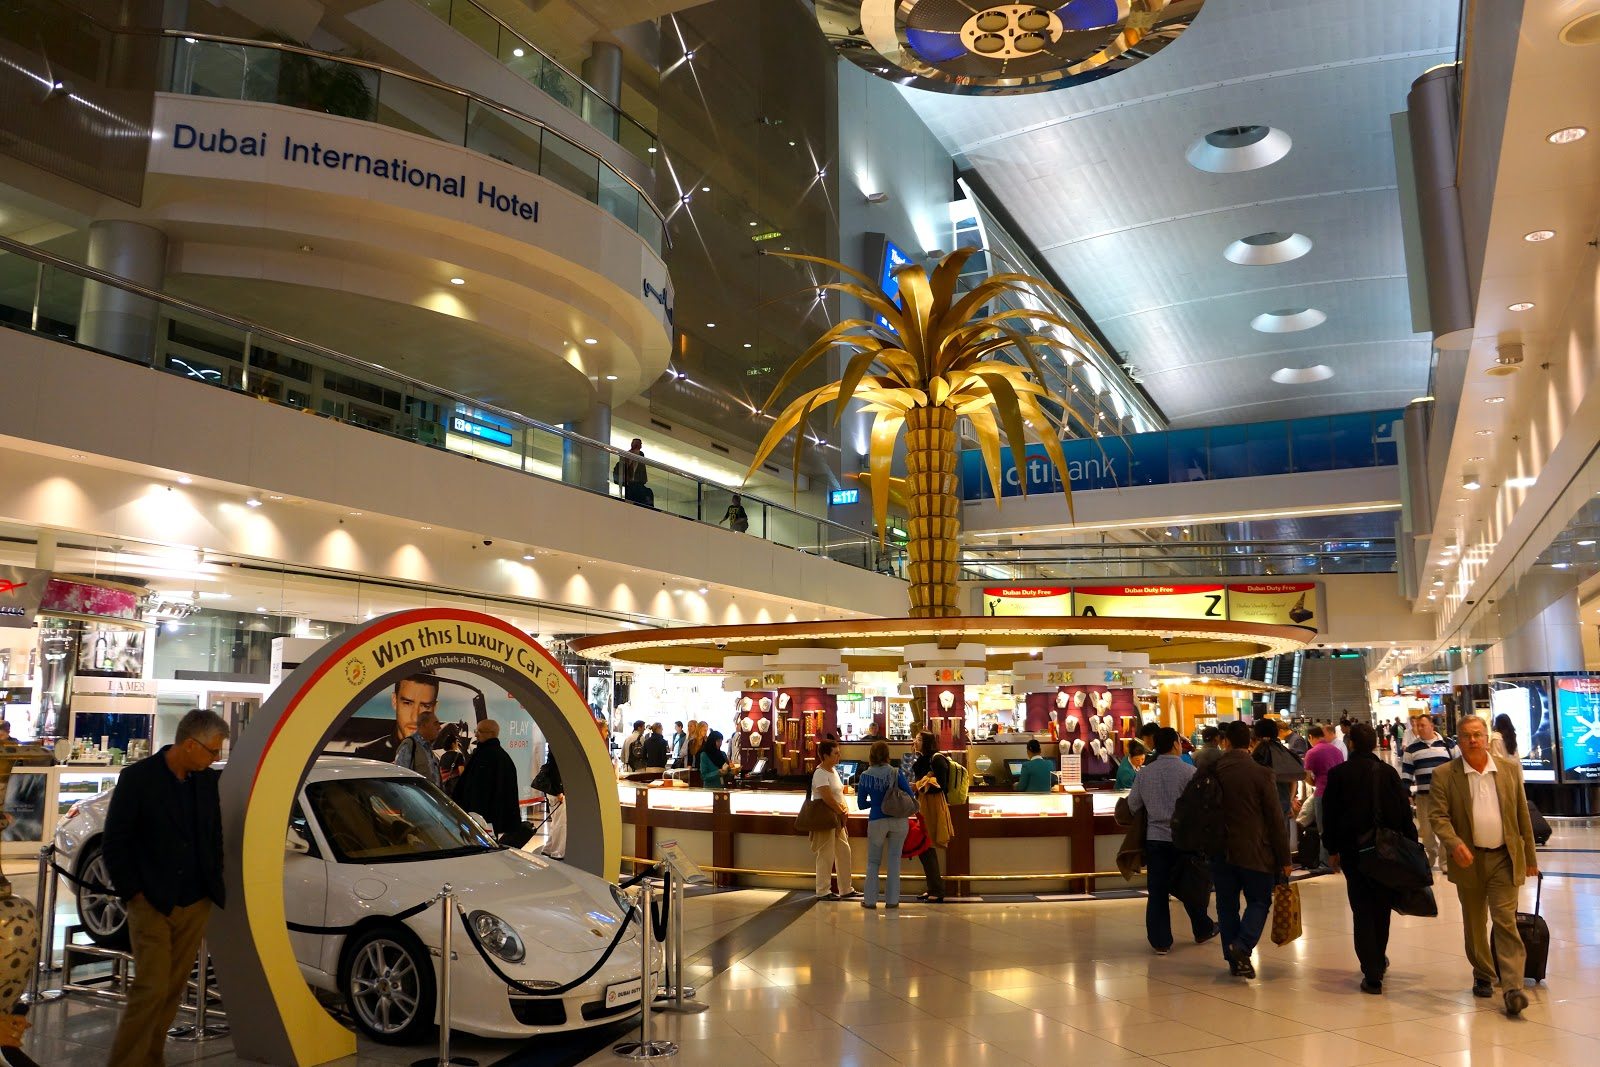 Oriental Adventures Win A Luxury Car From Dubai Duty Free